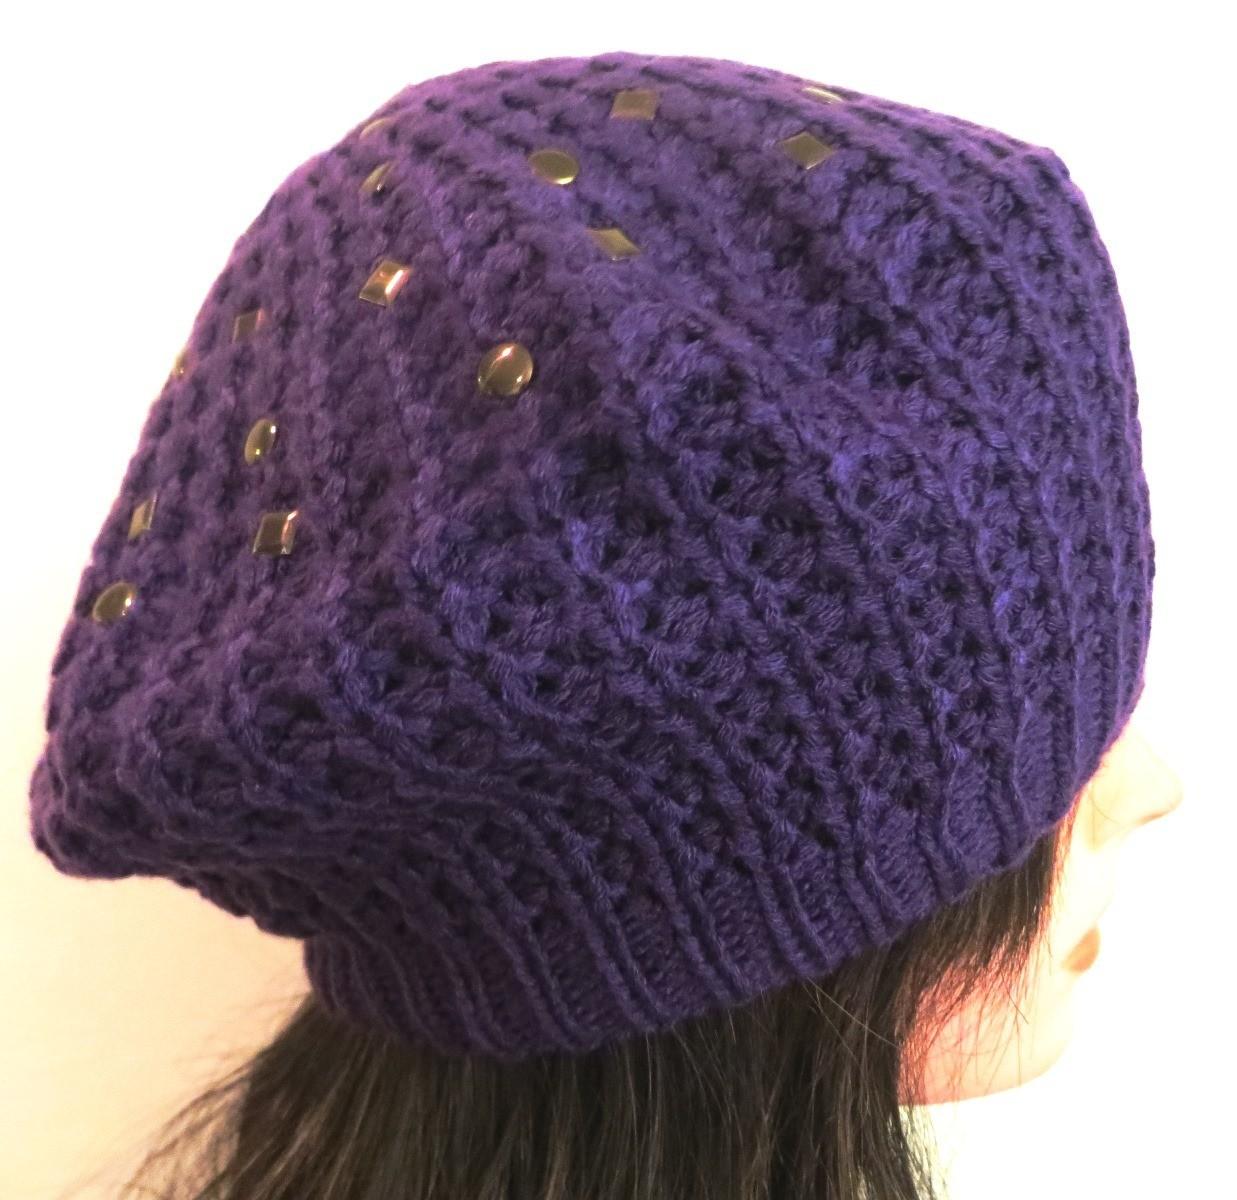 Purple beret with metal